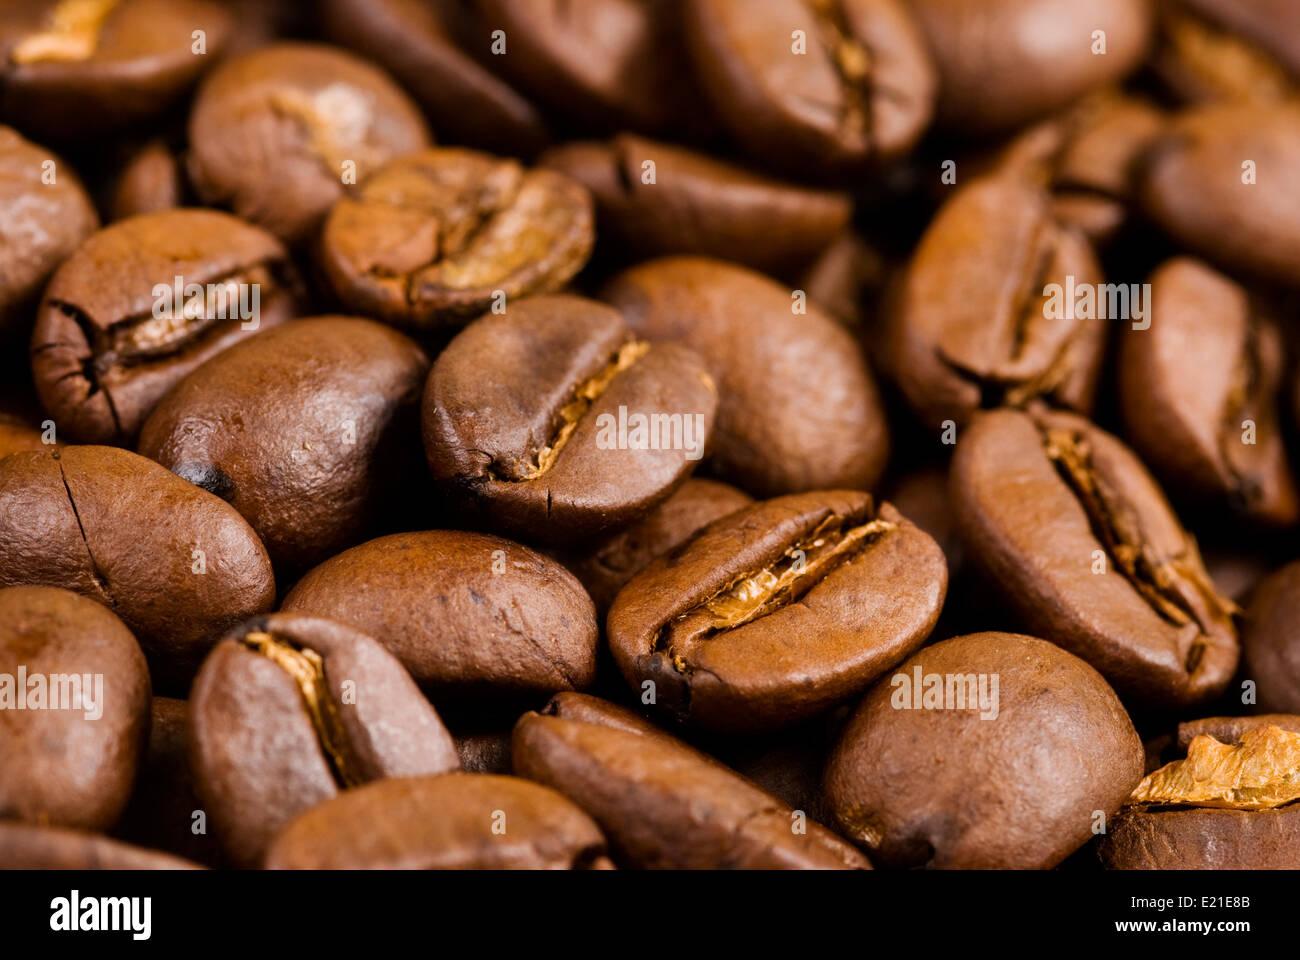 Full of coffee bean - Stock Image